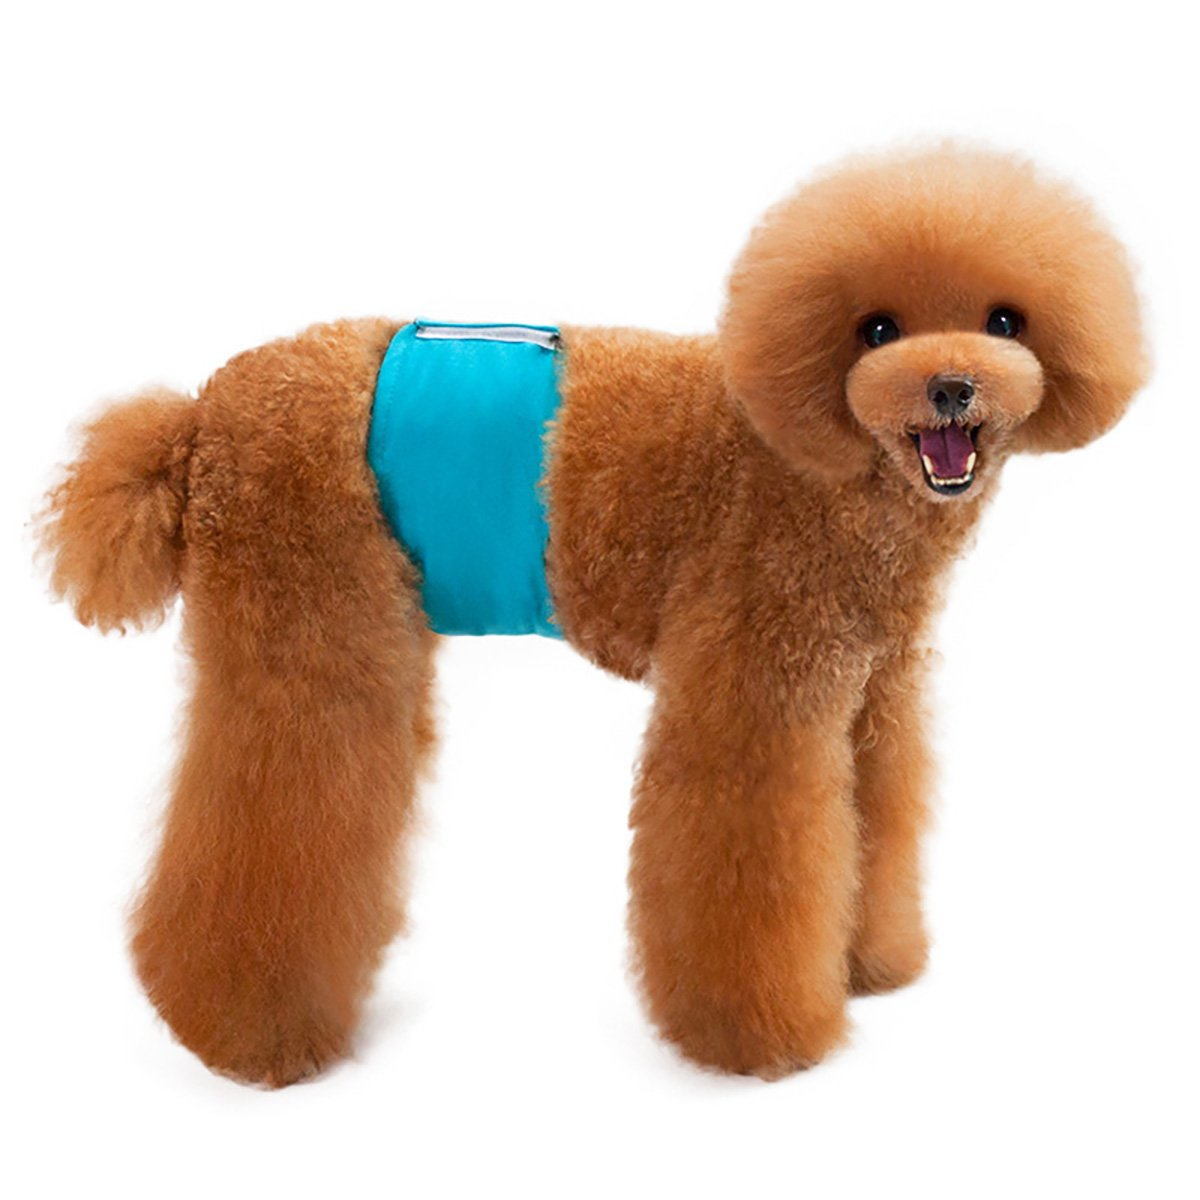 UHeng 4 PCS Male Dog Reusable Wrap Diaper Washable Puppy Belly Band by UHeng (Image #6)